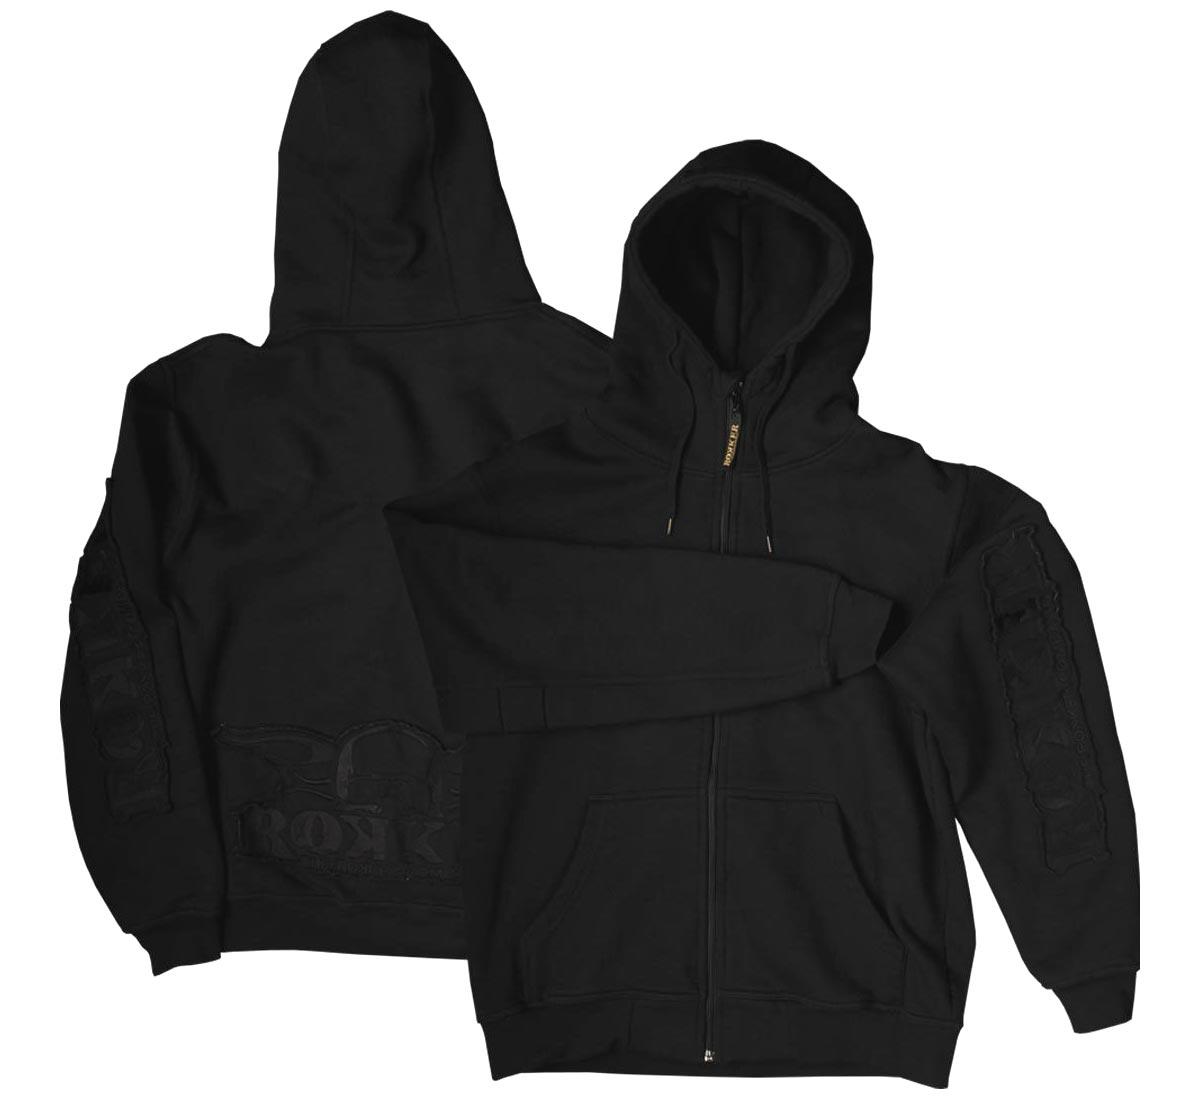 3d4529c07d4b55 Rokker Zip Hoodie, black for men & women at Thunderbike Shop